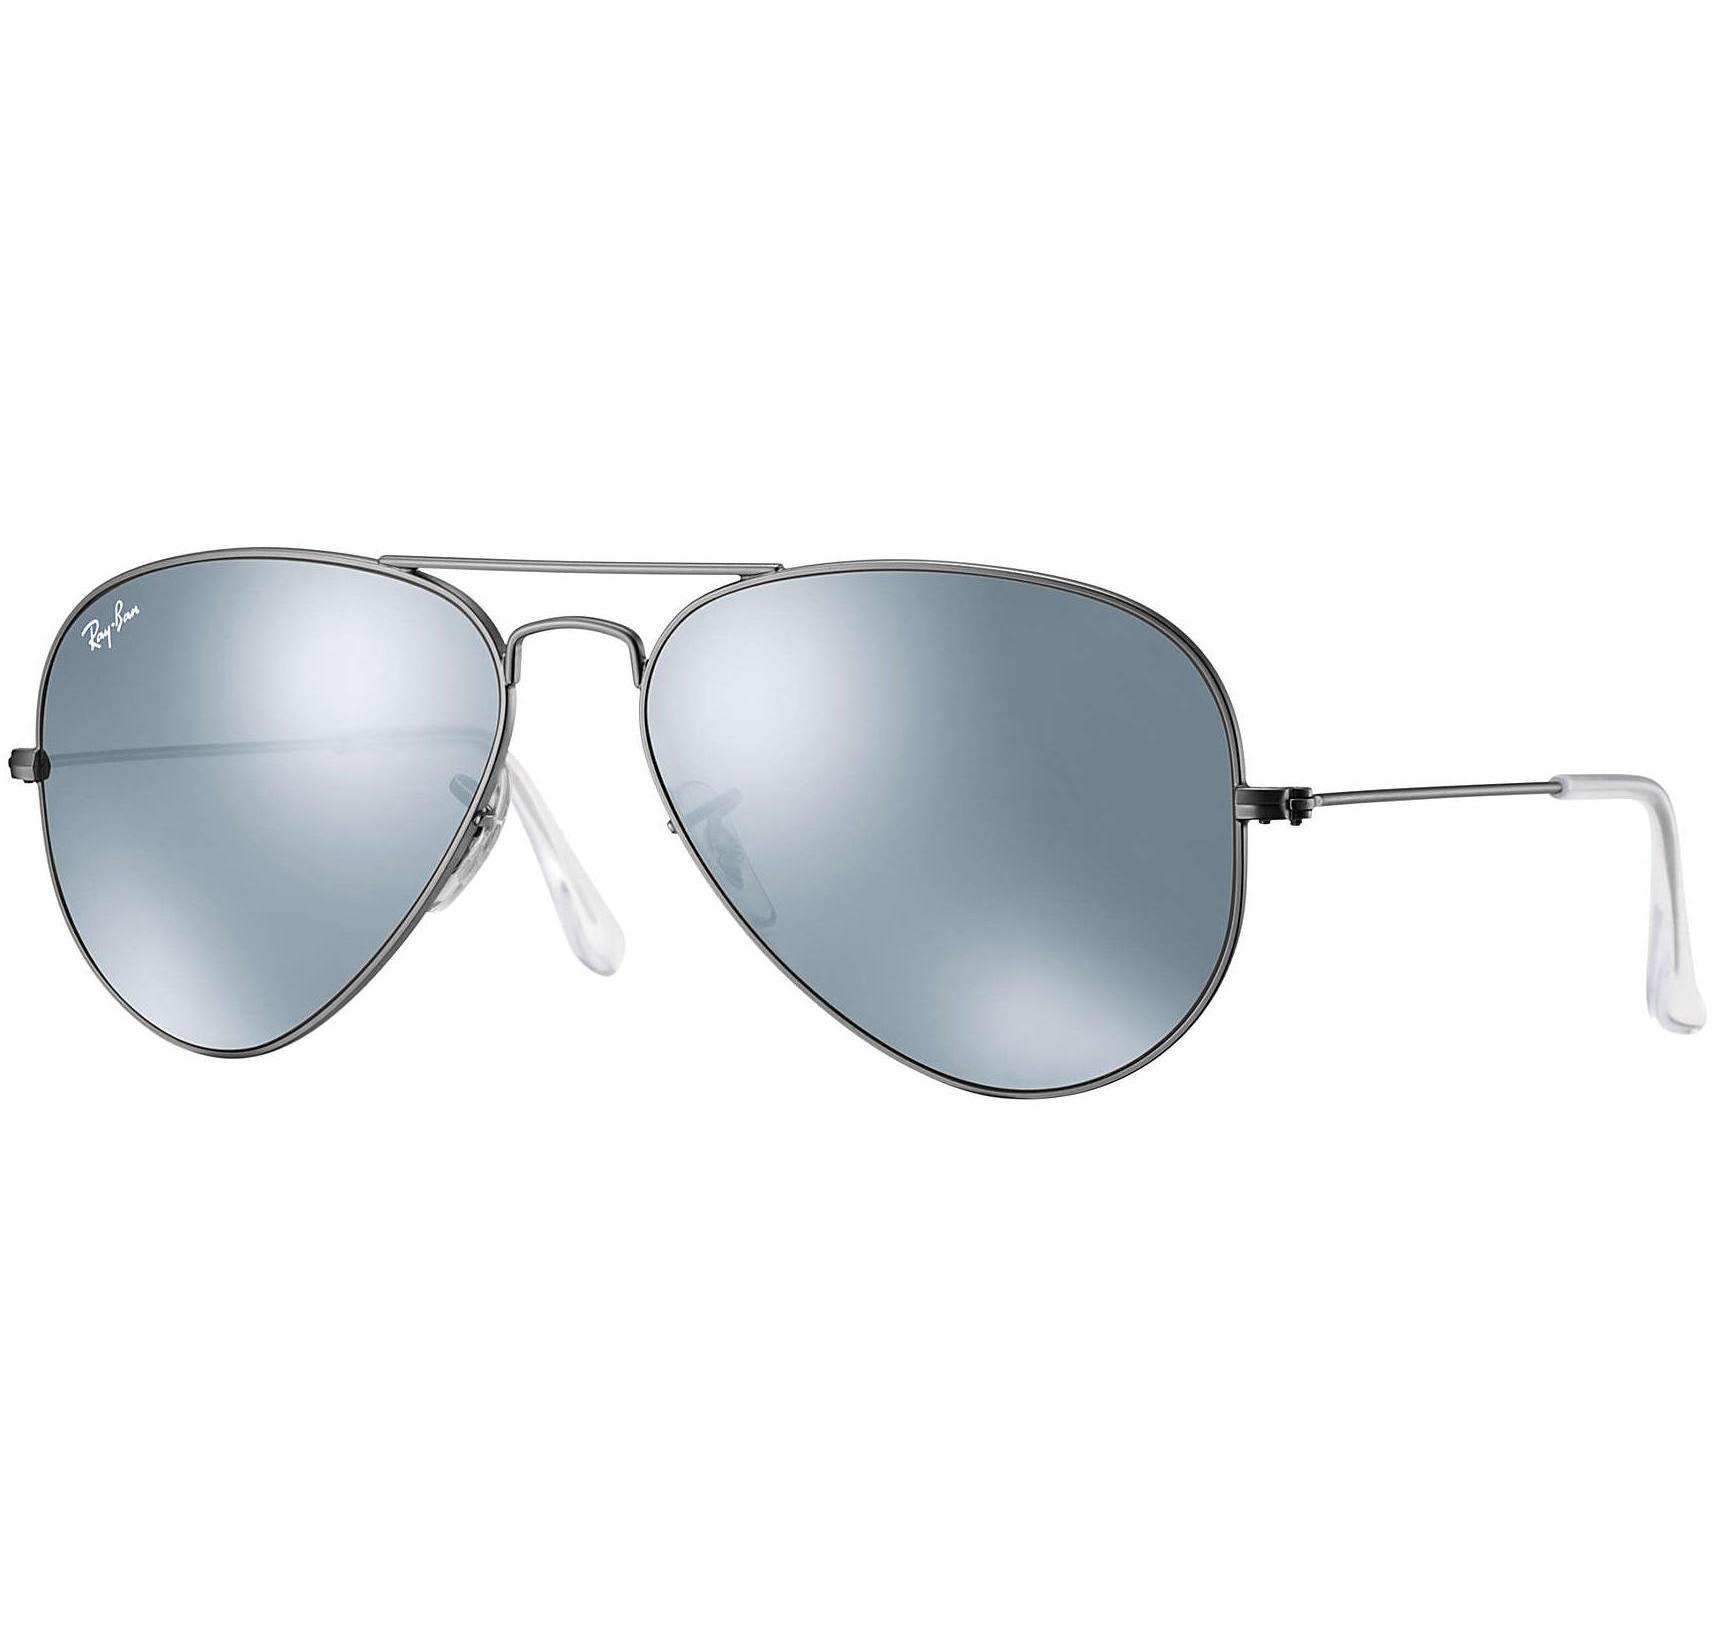 2b60cfaa9f3 Buy Ray-ban Aviator Gunmetal silver Flash Lens in Dubai at cheap price